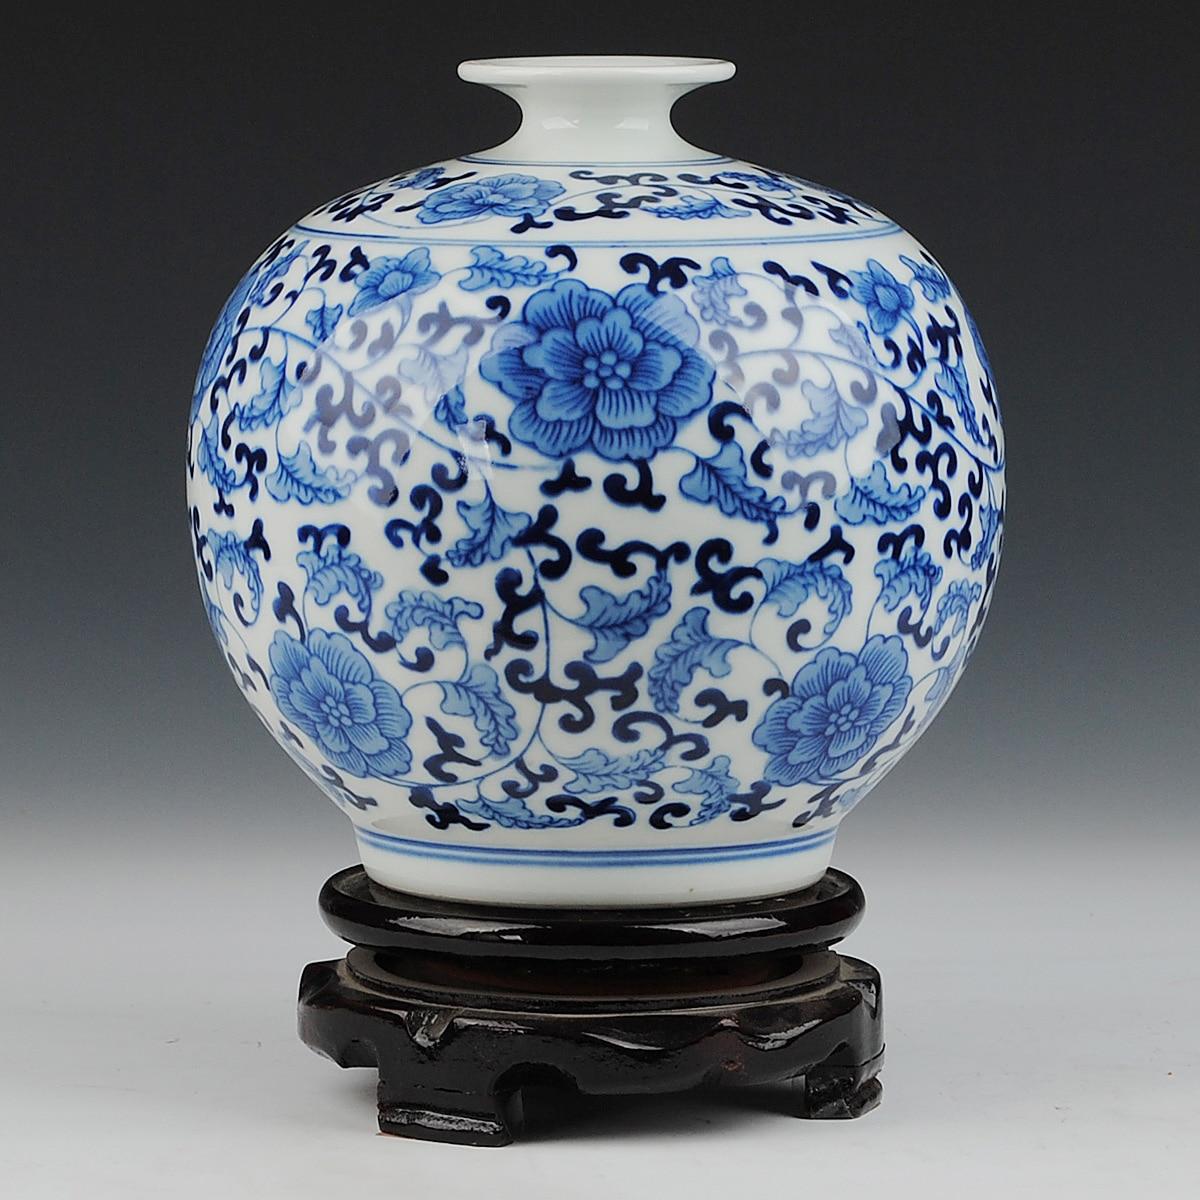 Ceramics blue and white porcelain glaze pomegranate vase decoration fashion home decoration crafts